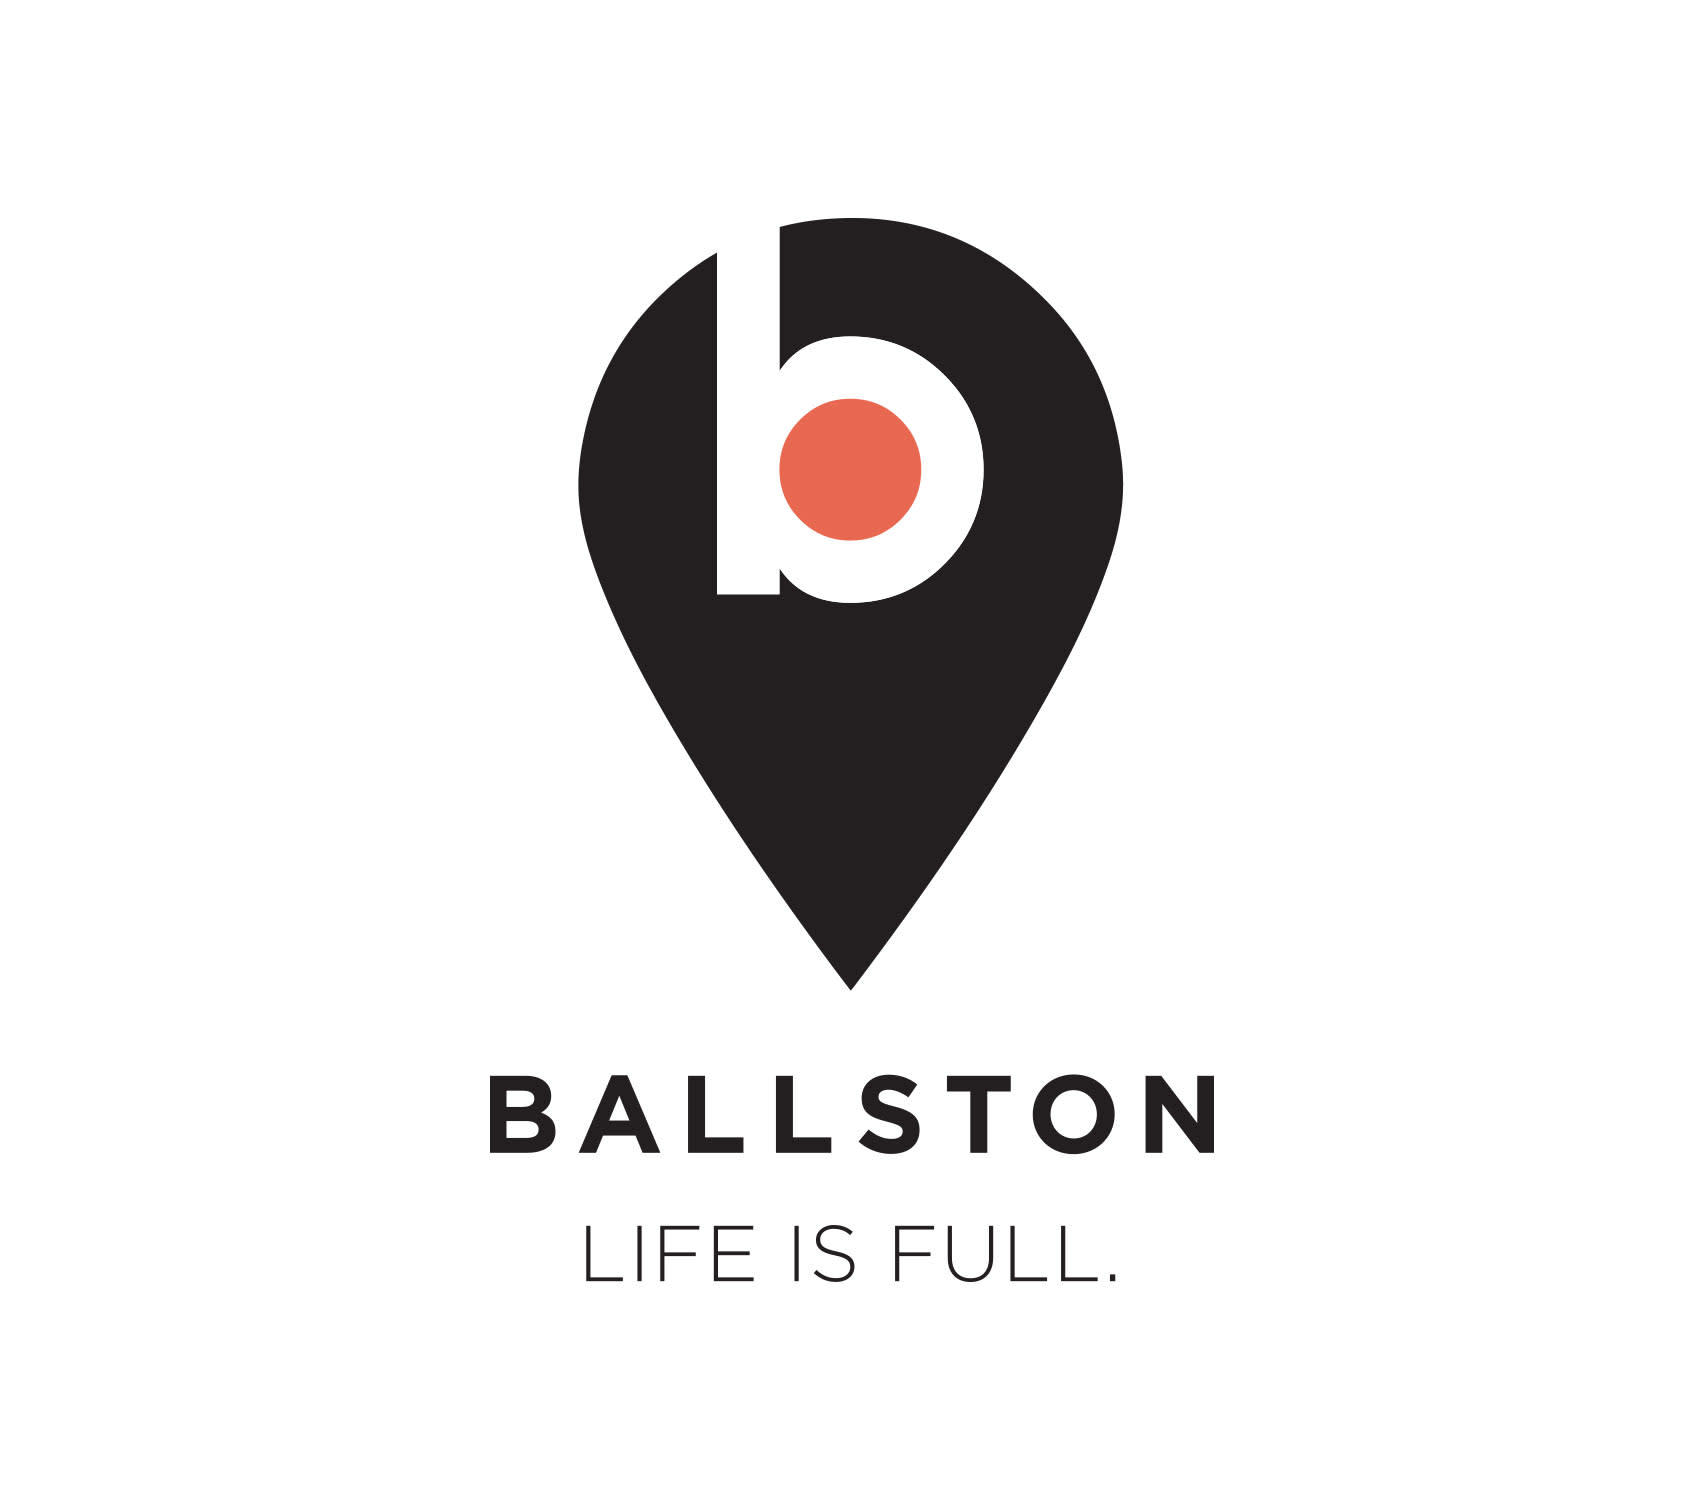 Ballston Business Improvement District (BID)